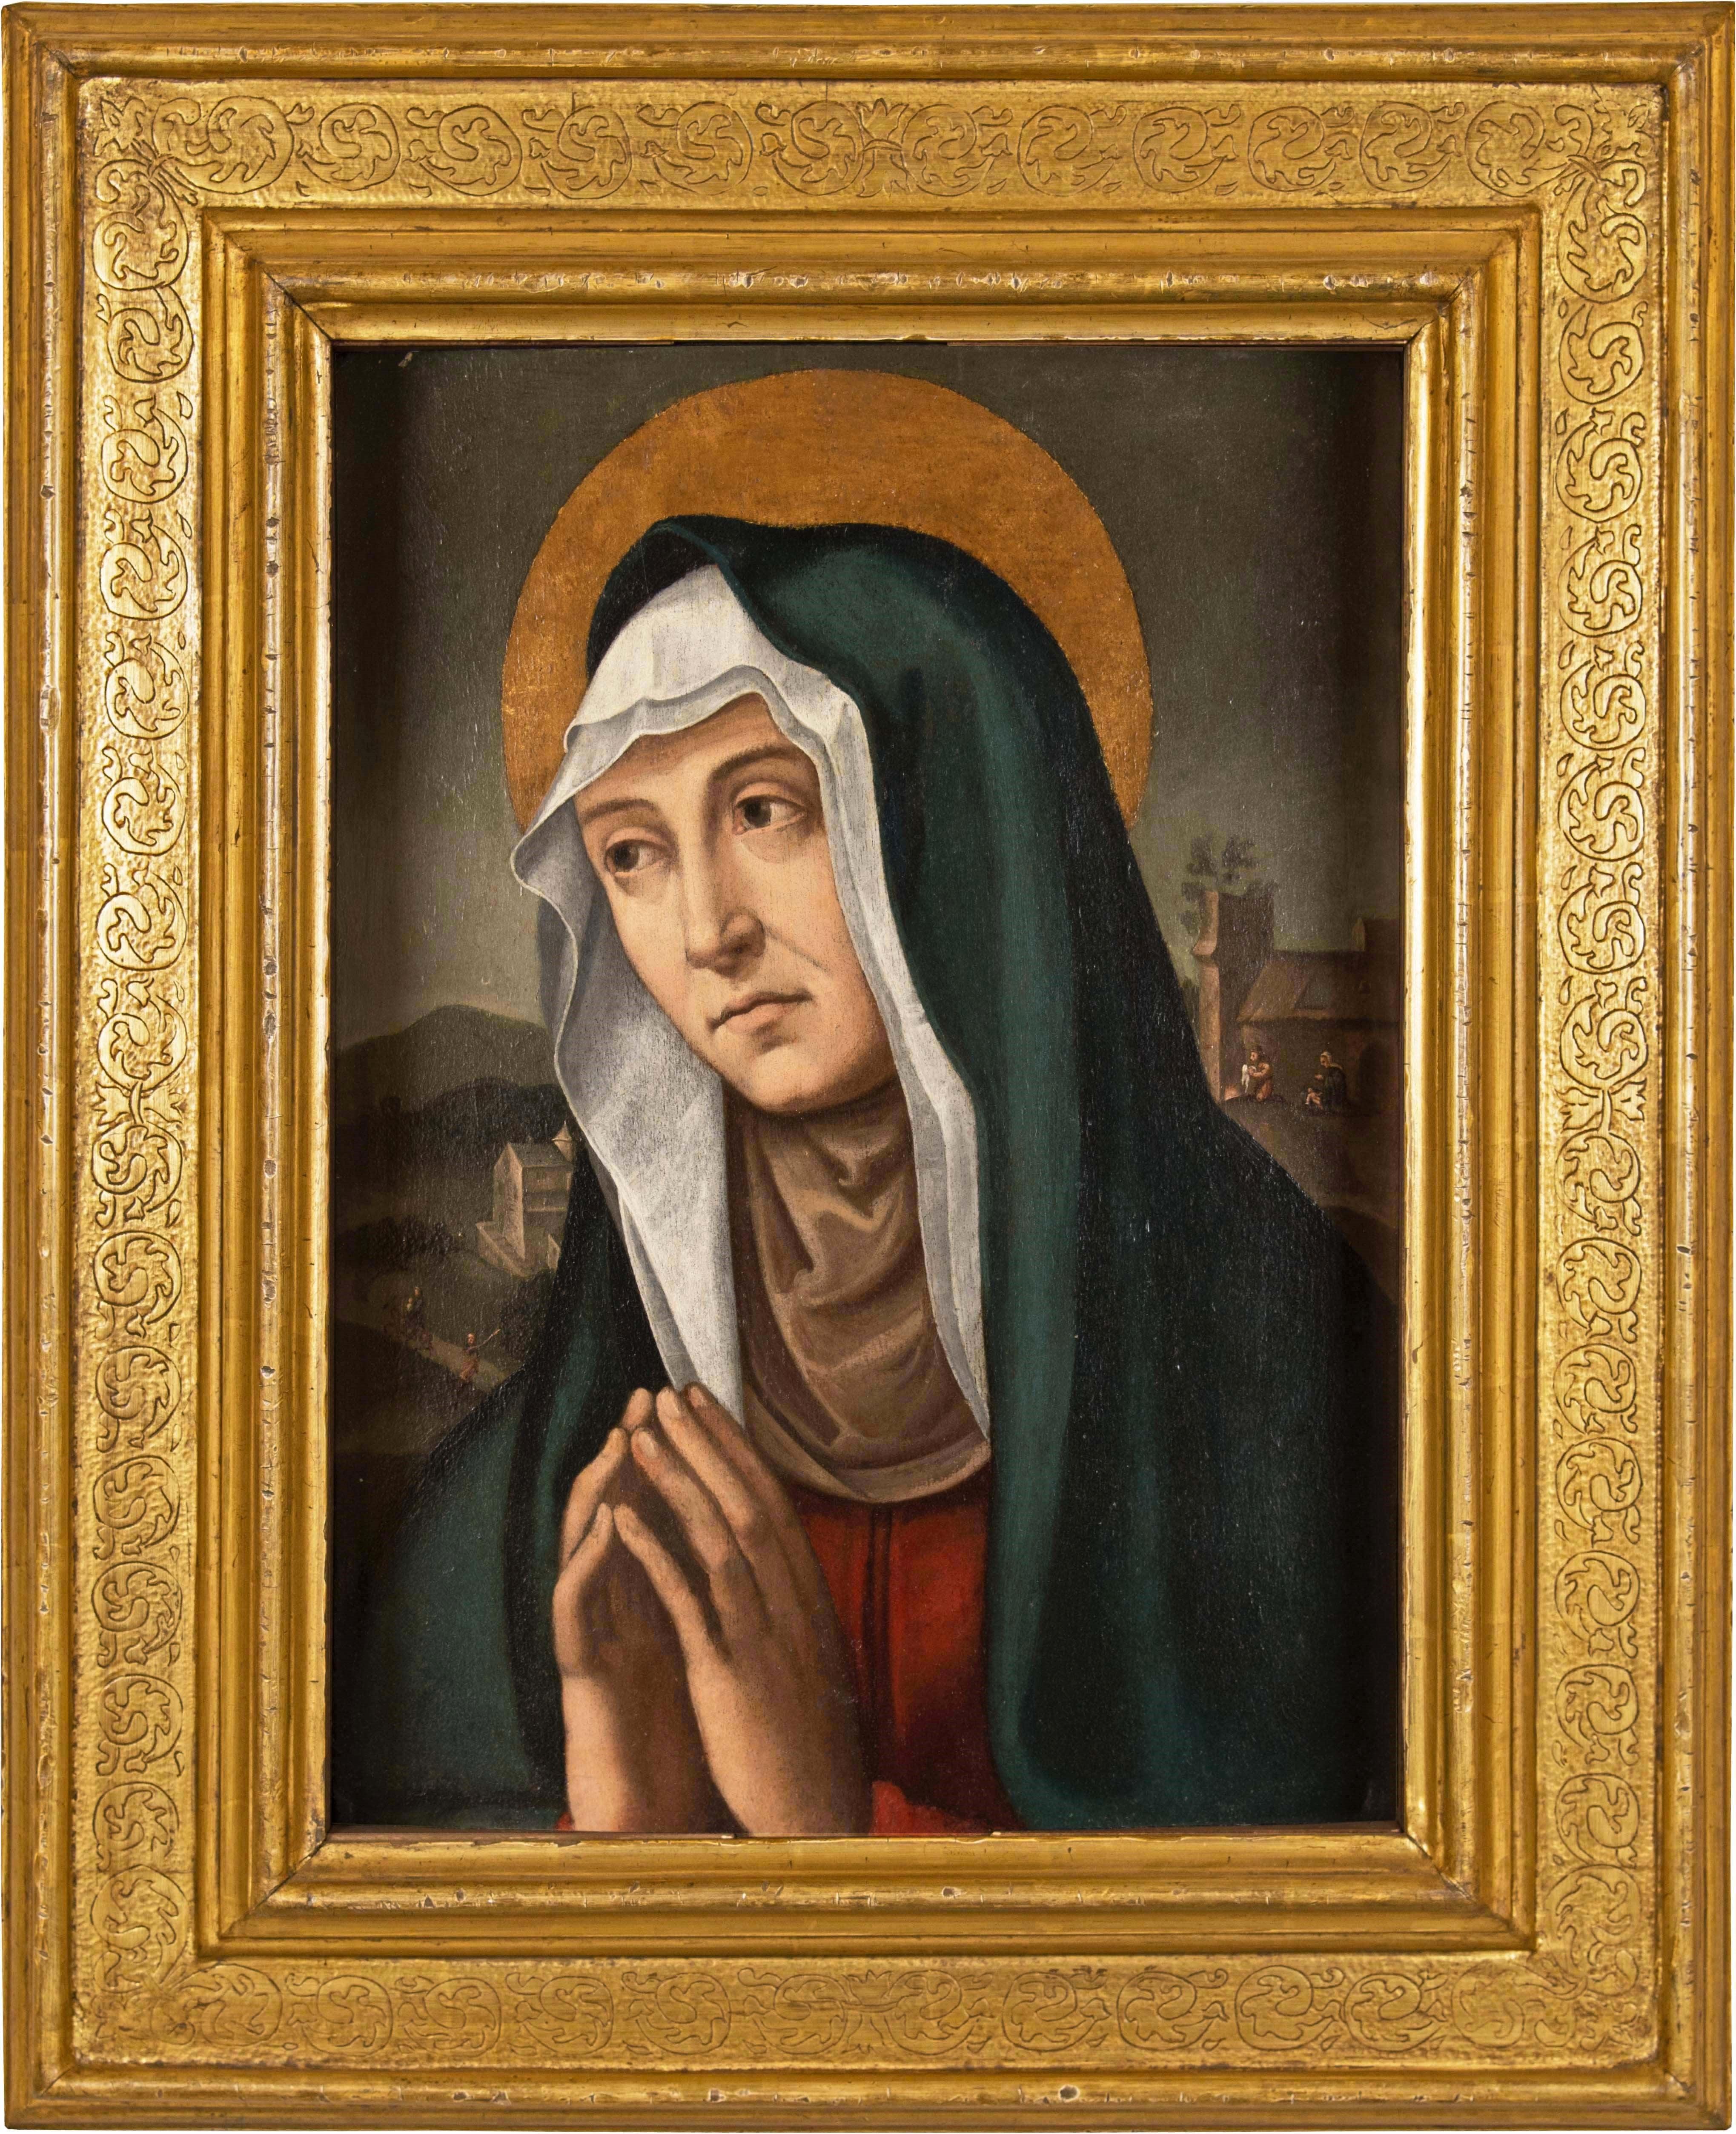 16-17th century Italian figure painting - Anne - Oil on panel Renaissence